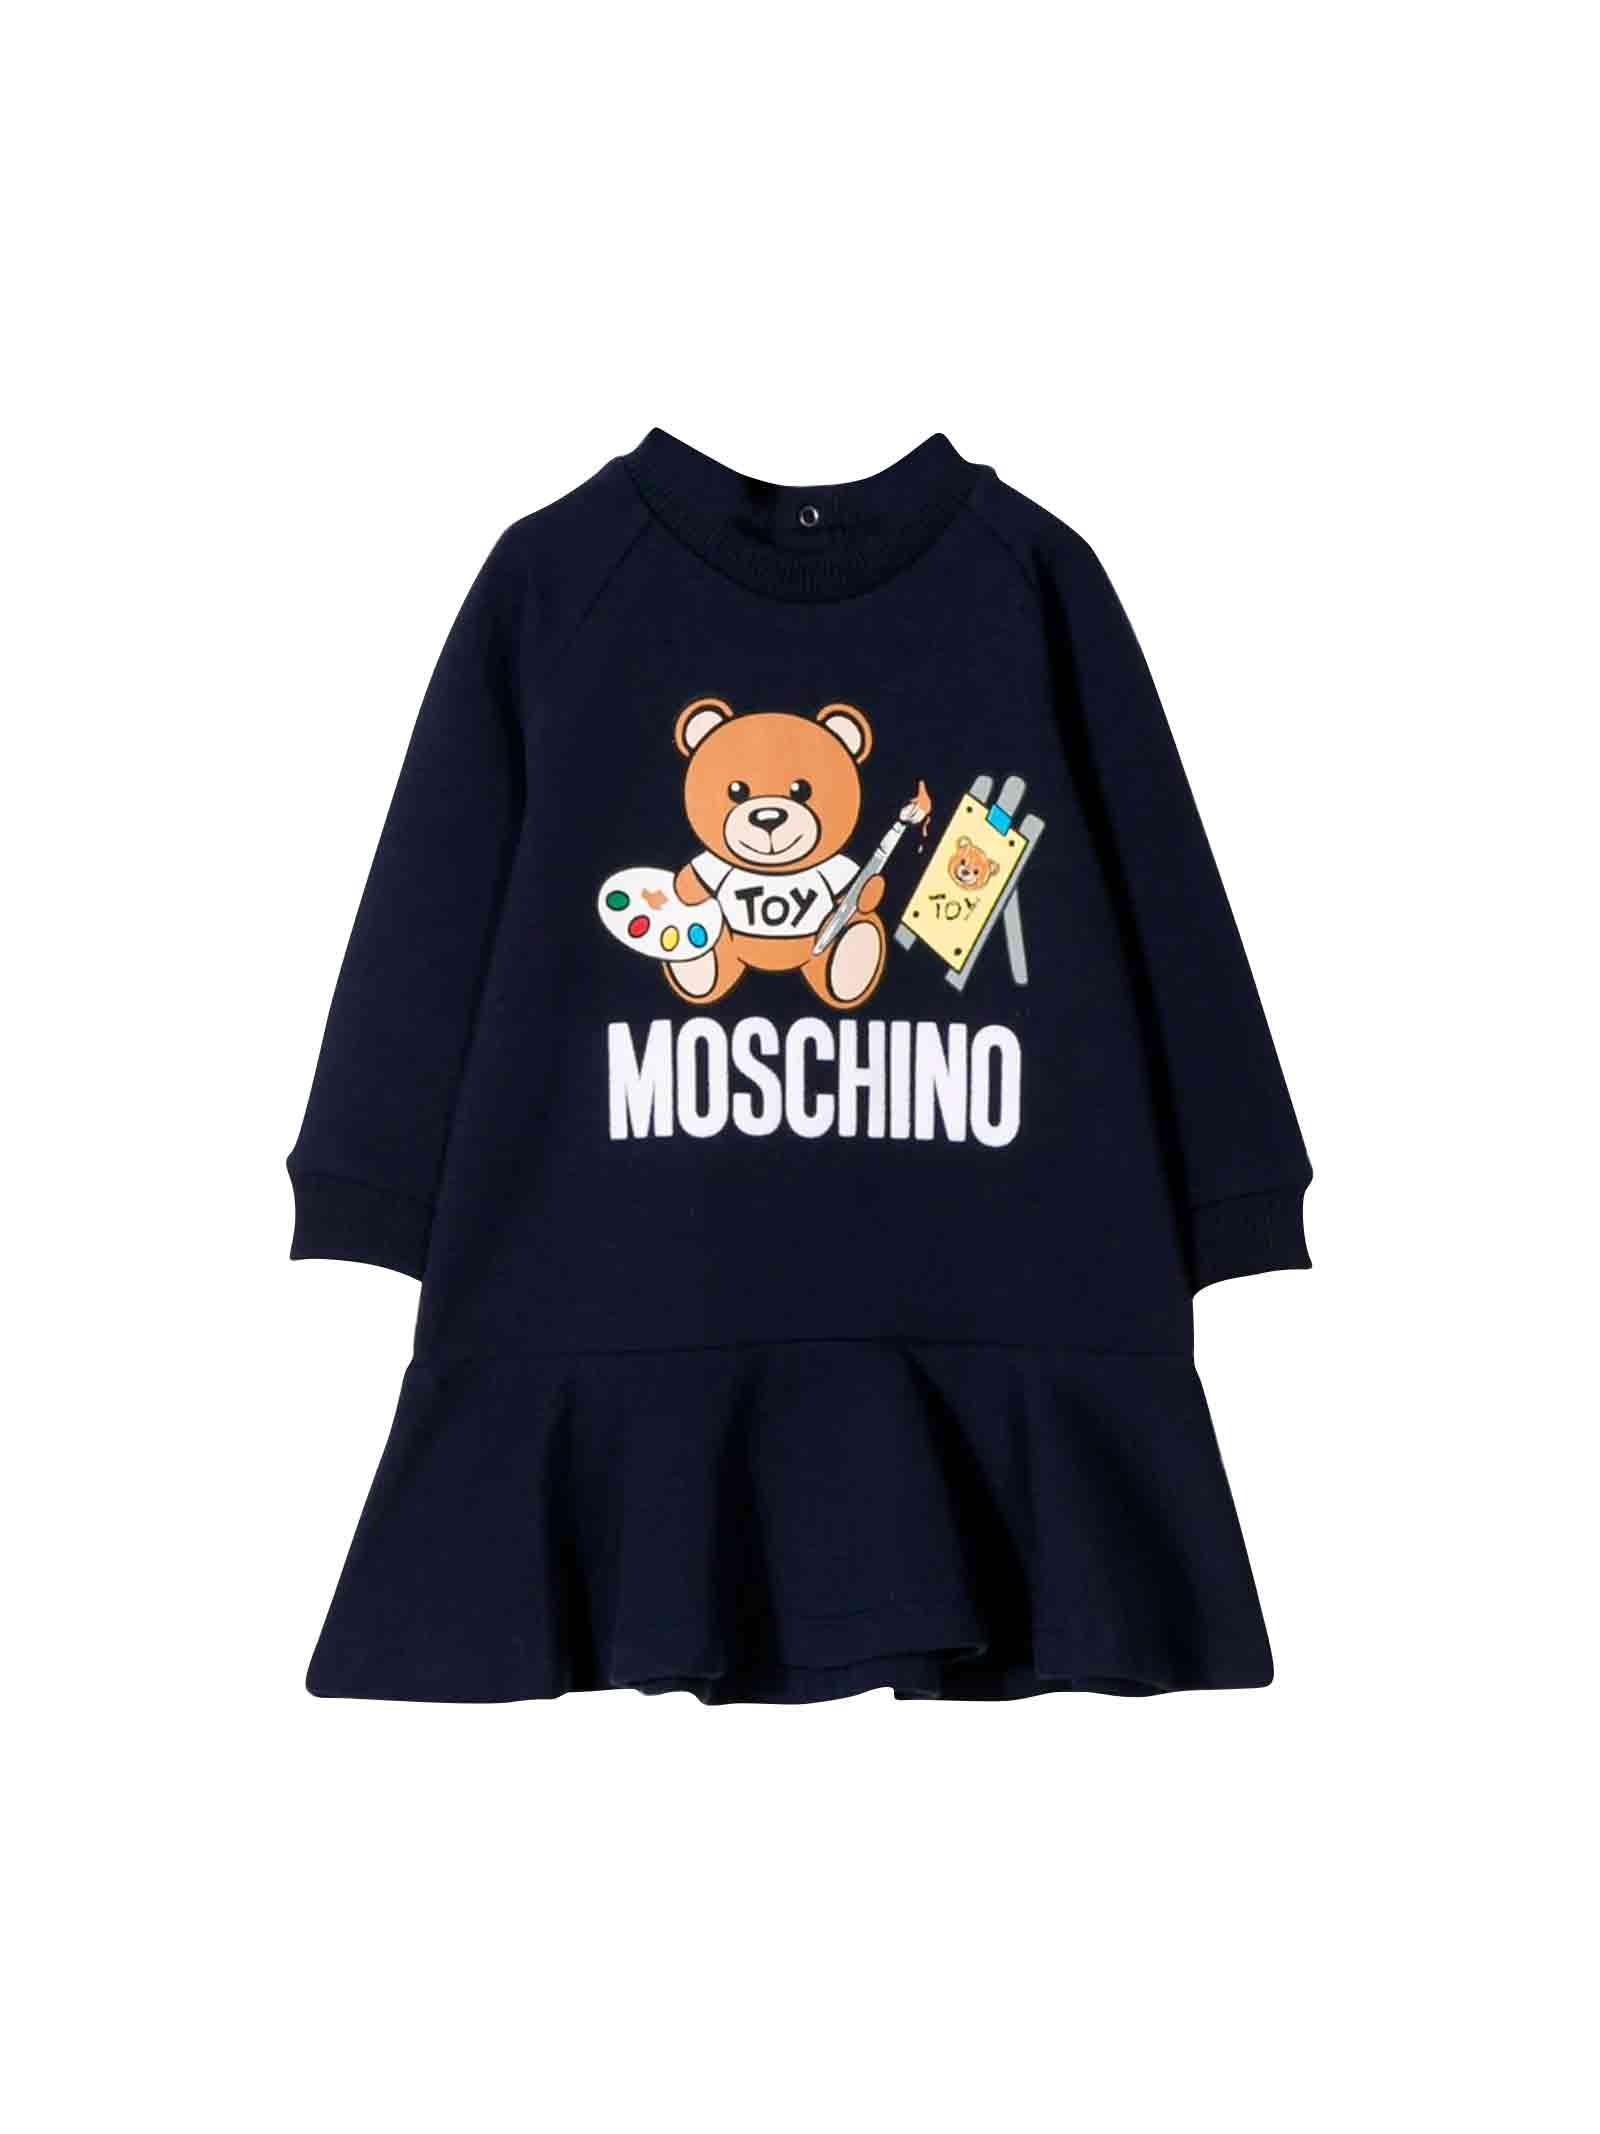 Moschino Midnight Blue Dress